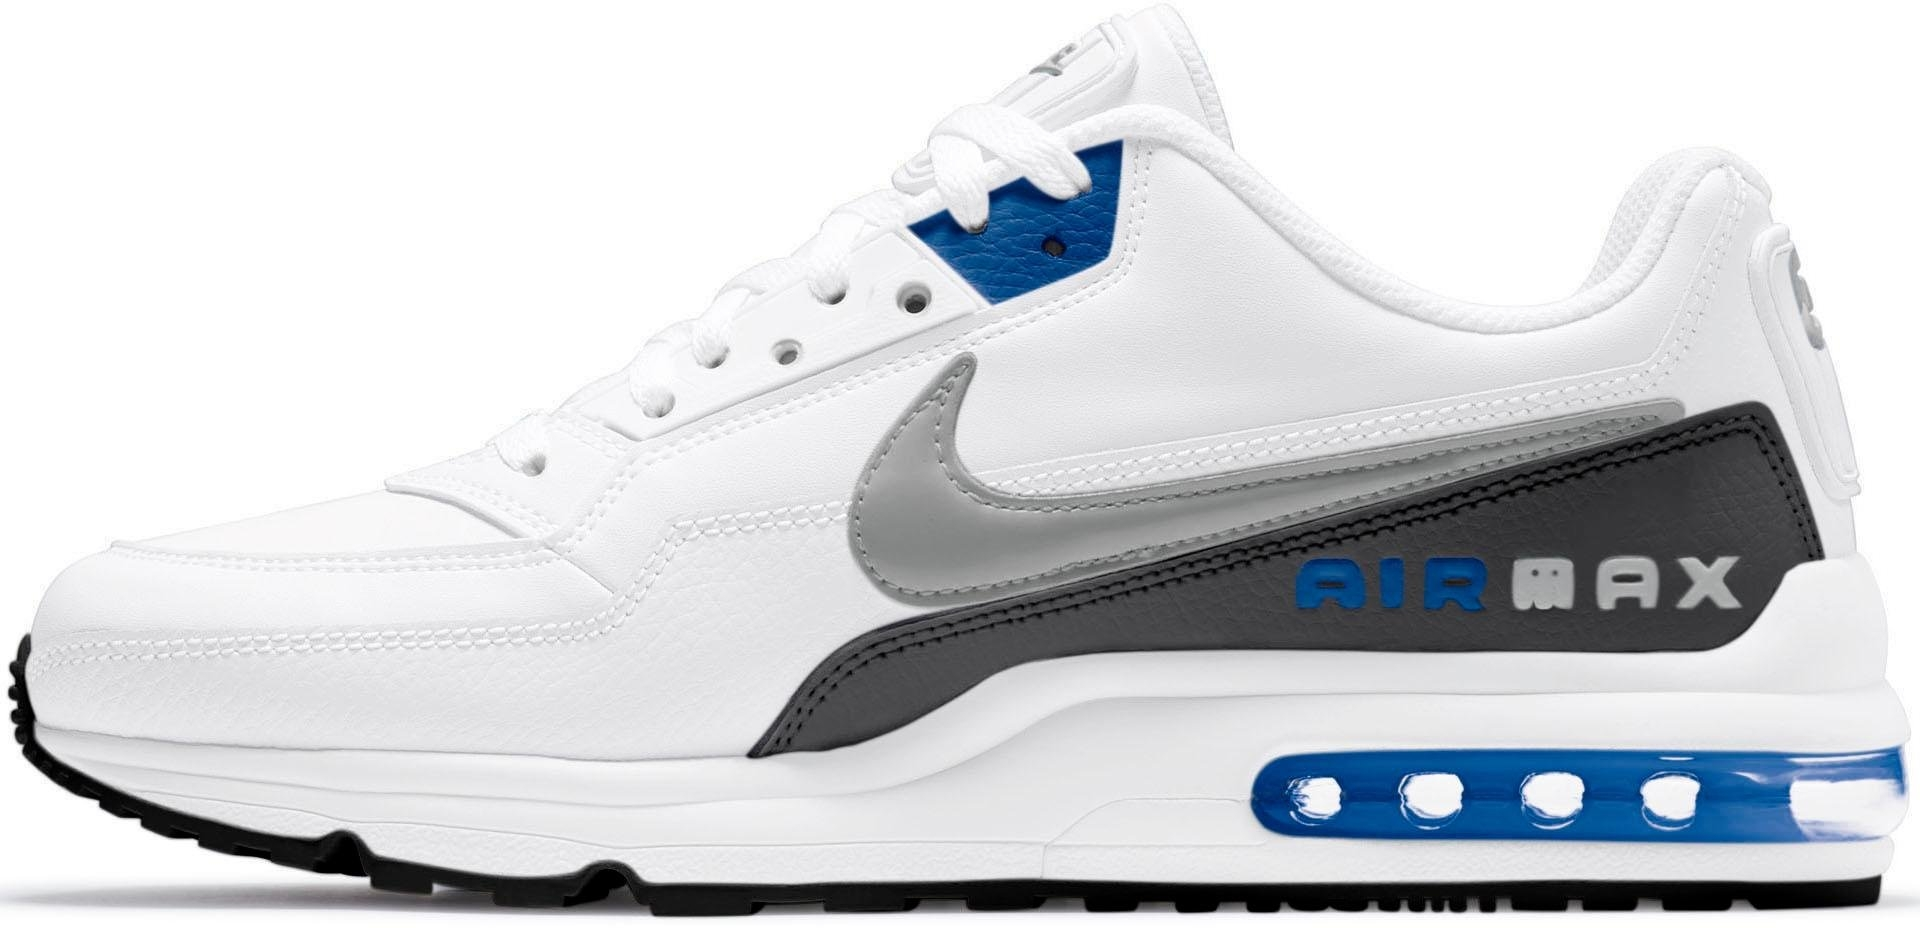 Nike sneakers goedkoop op otto.nl kopen